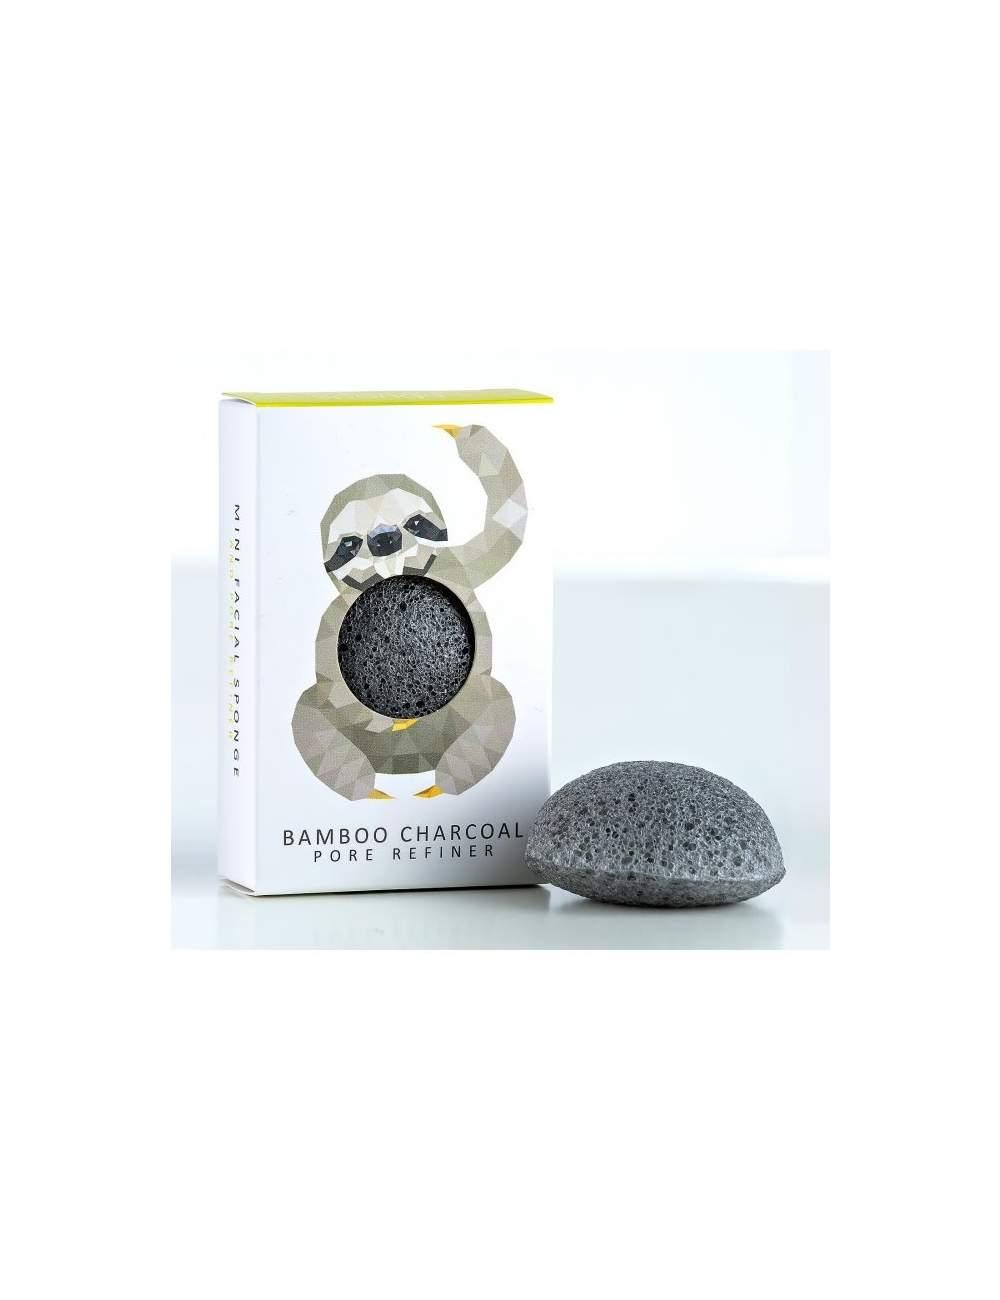 Esponja Konjac Facial Natural de Carbón de Bambú Mini. Rainforest Sloth. The Konjac Sponge